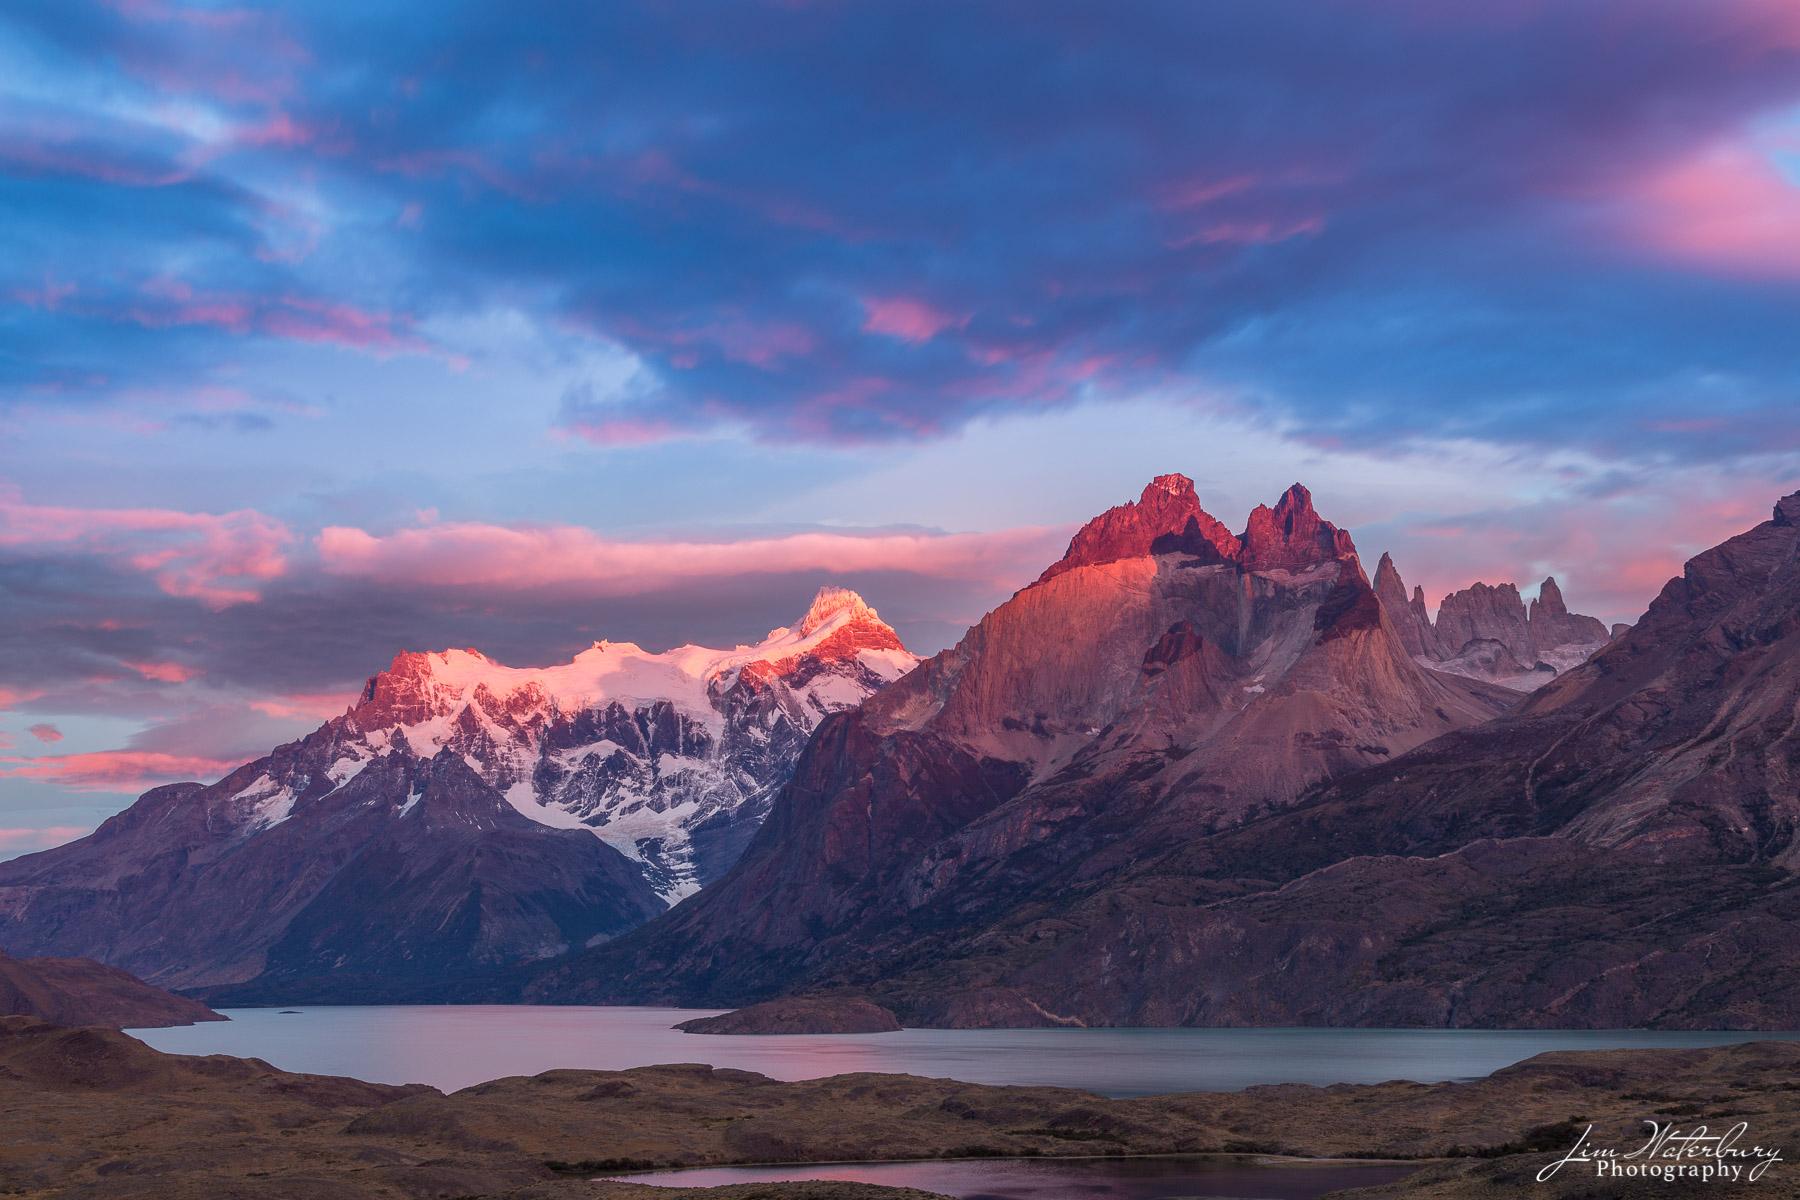 Sunrise over Cerro Torre Massif, Patagonia, reflected in Lago Torre, Los Glaciares National Park, Argentina